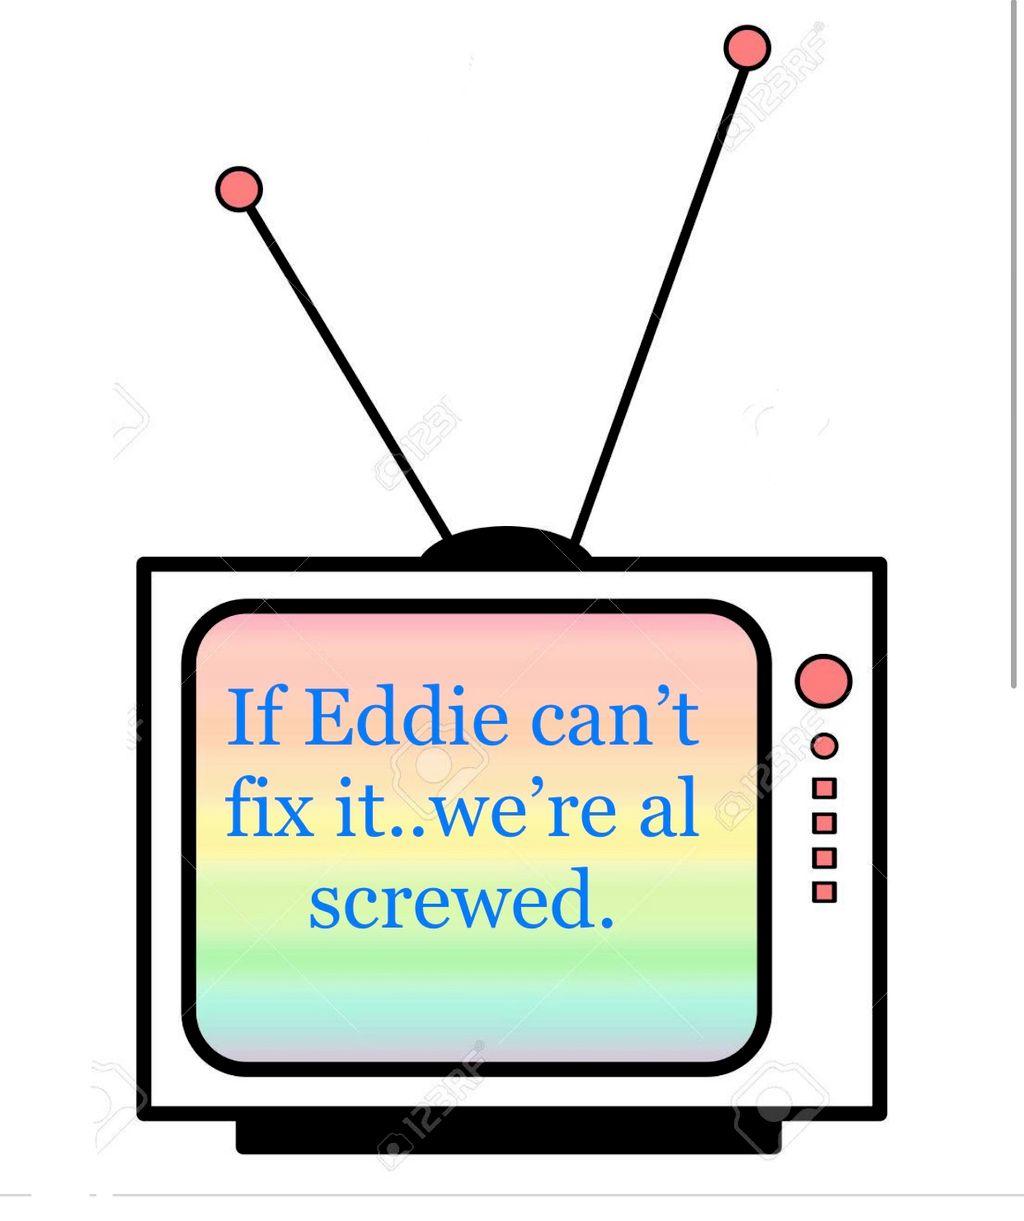 Eddie Electric And TV Mount handyman LLC